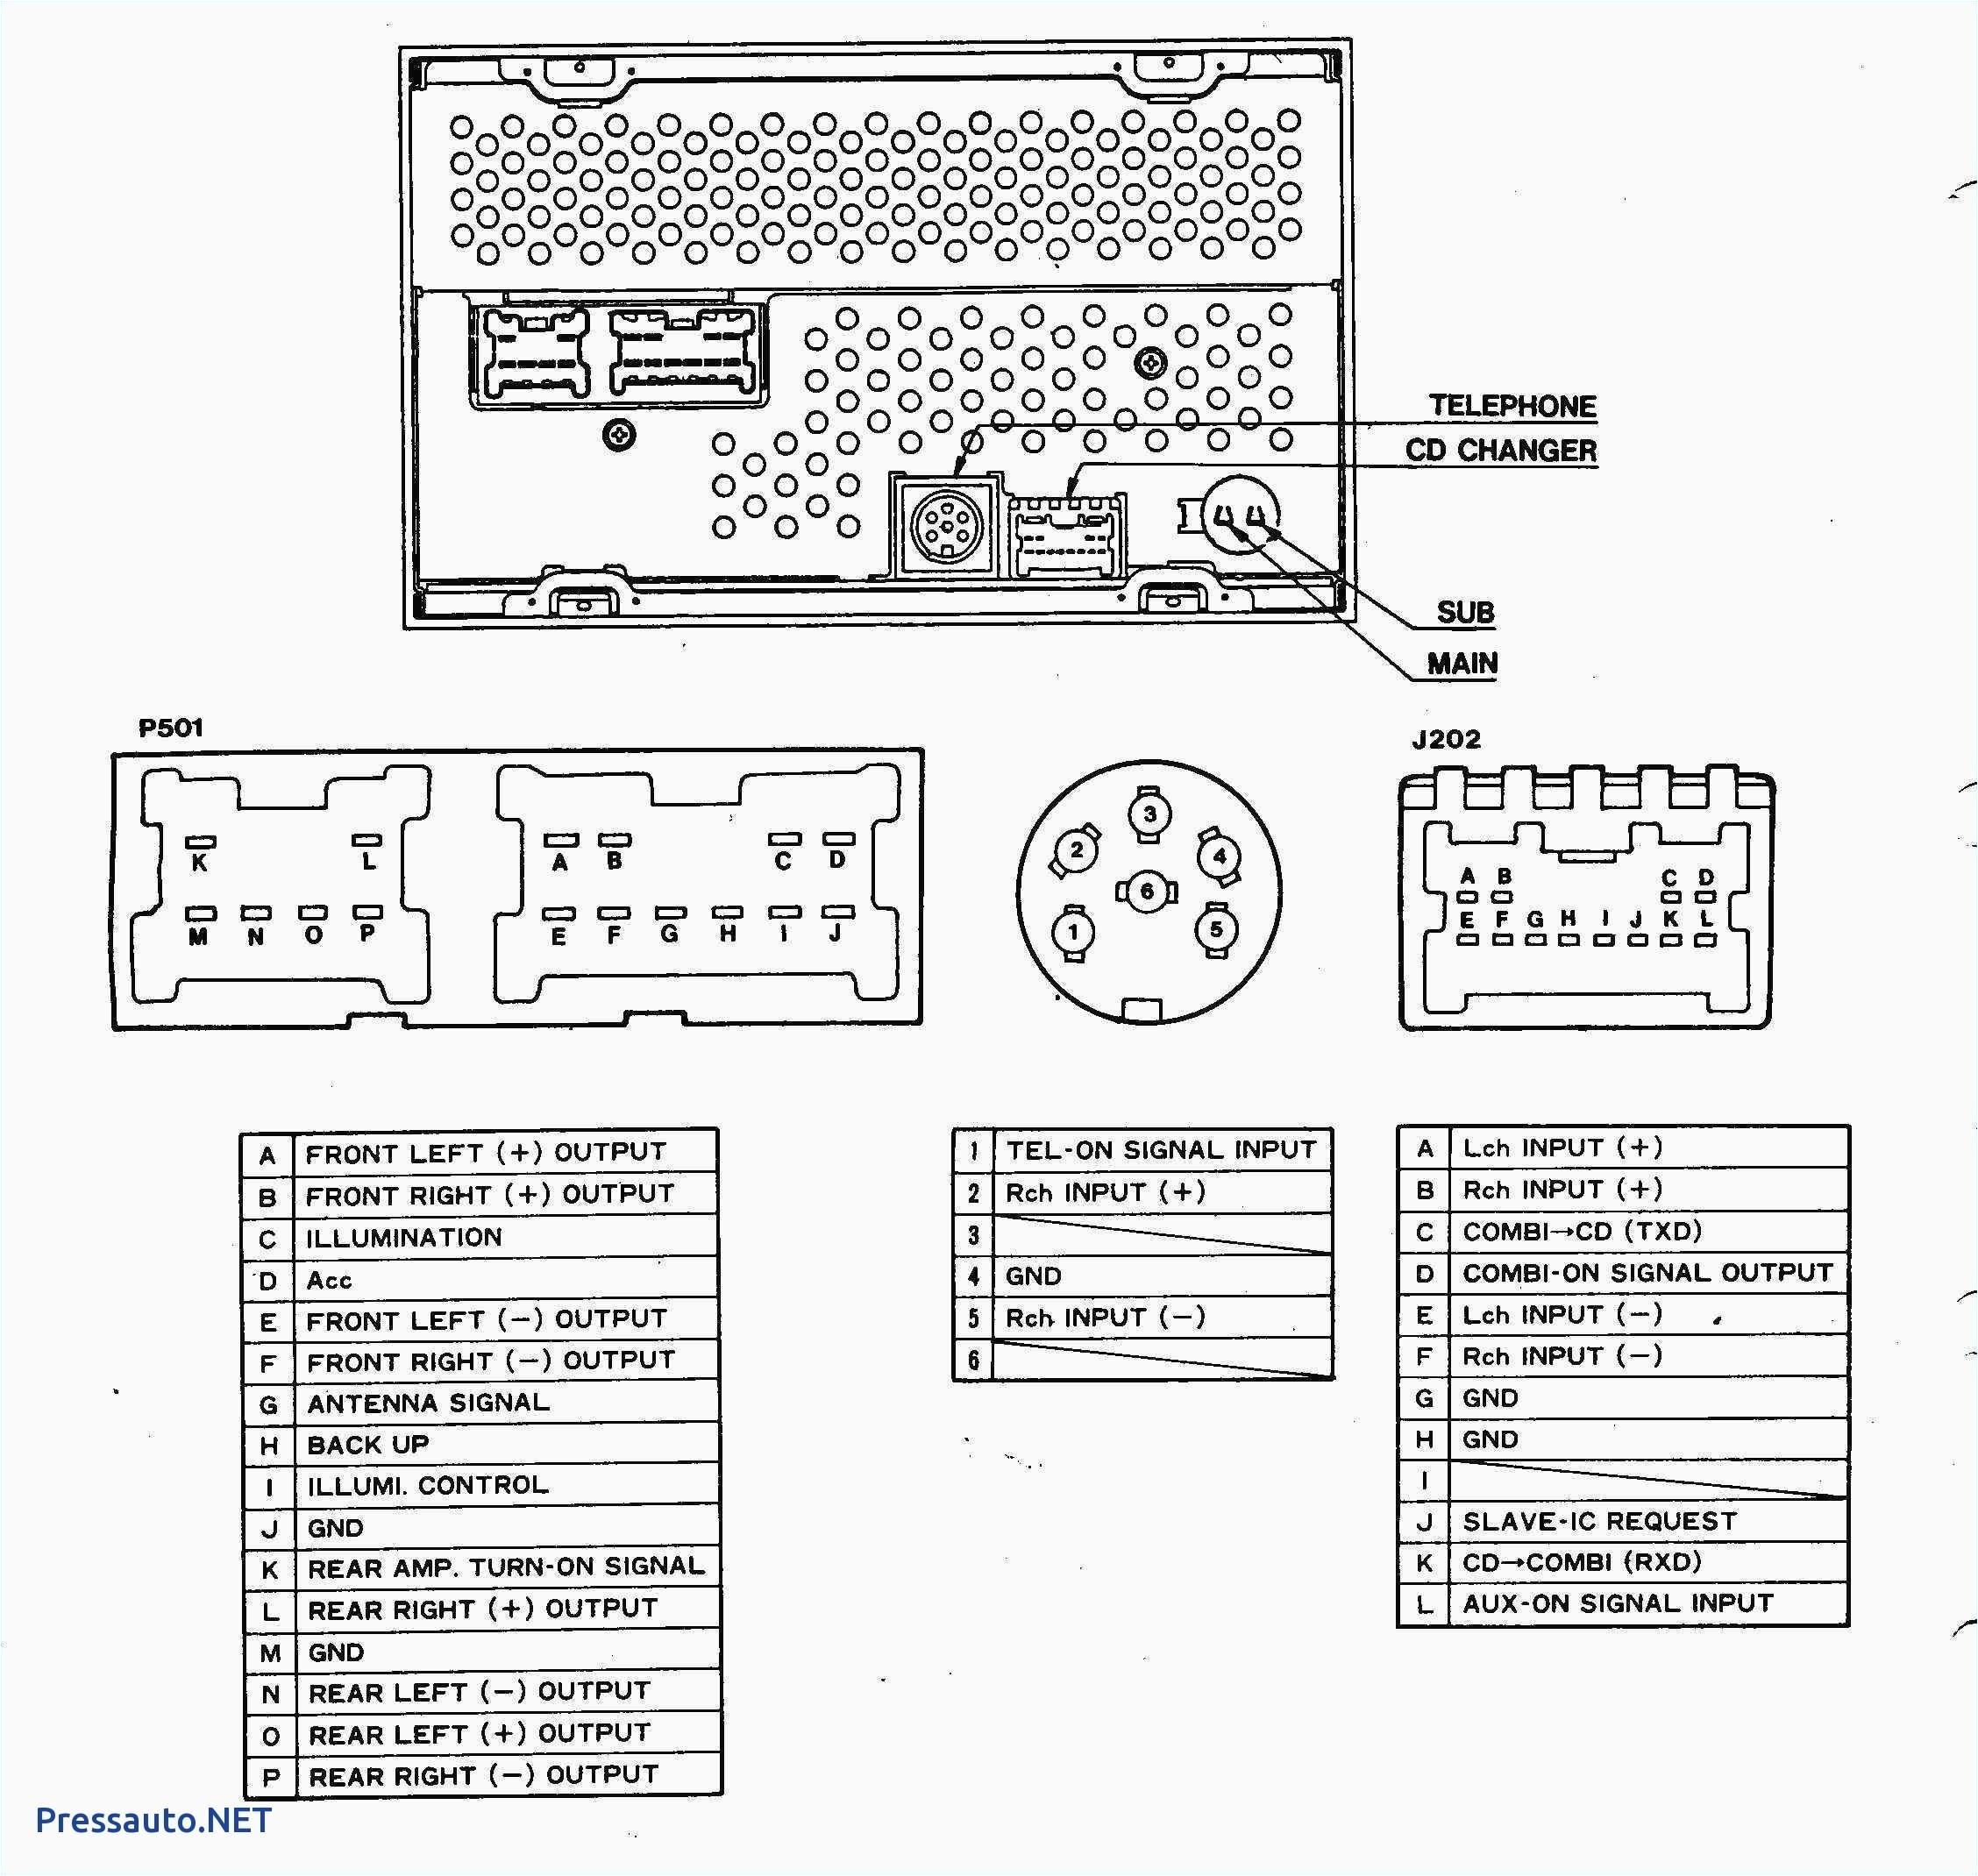 z3 stereo wiring diagram wiring diagram 2000 bmw z3 speaker wiring diagram